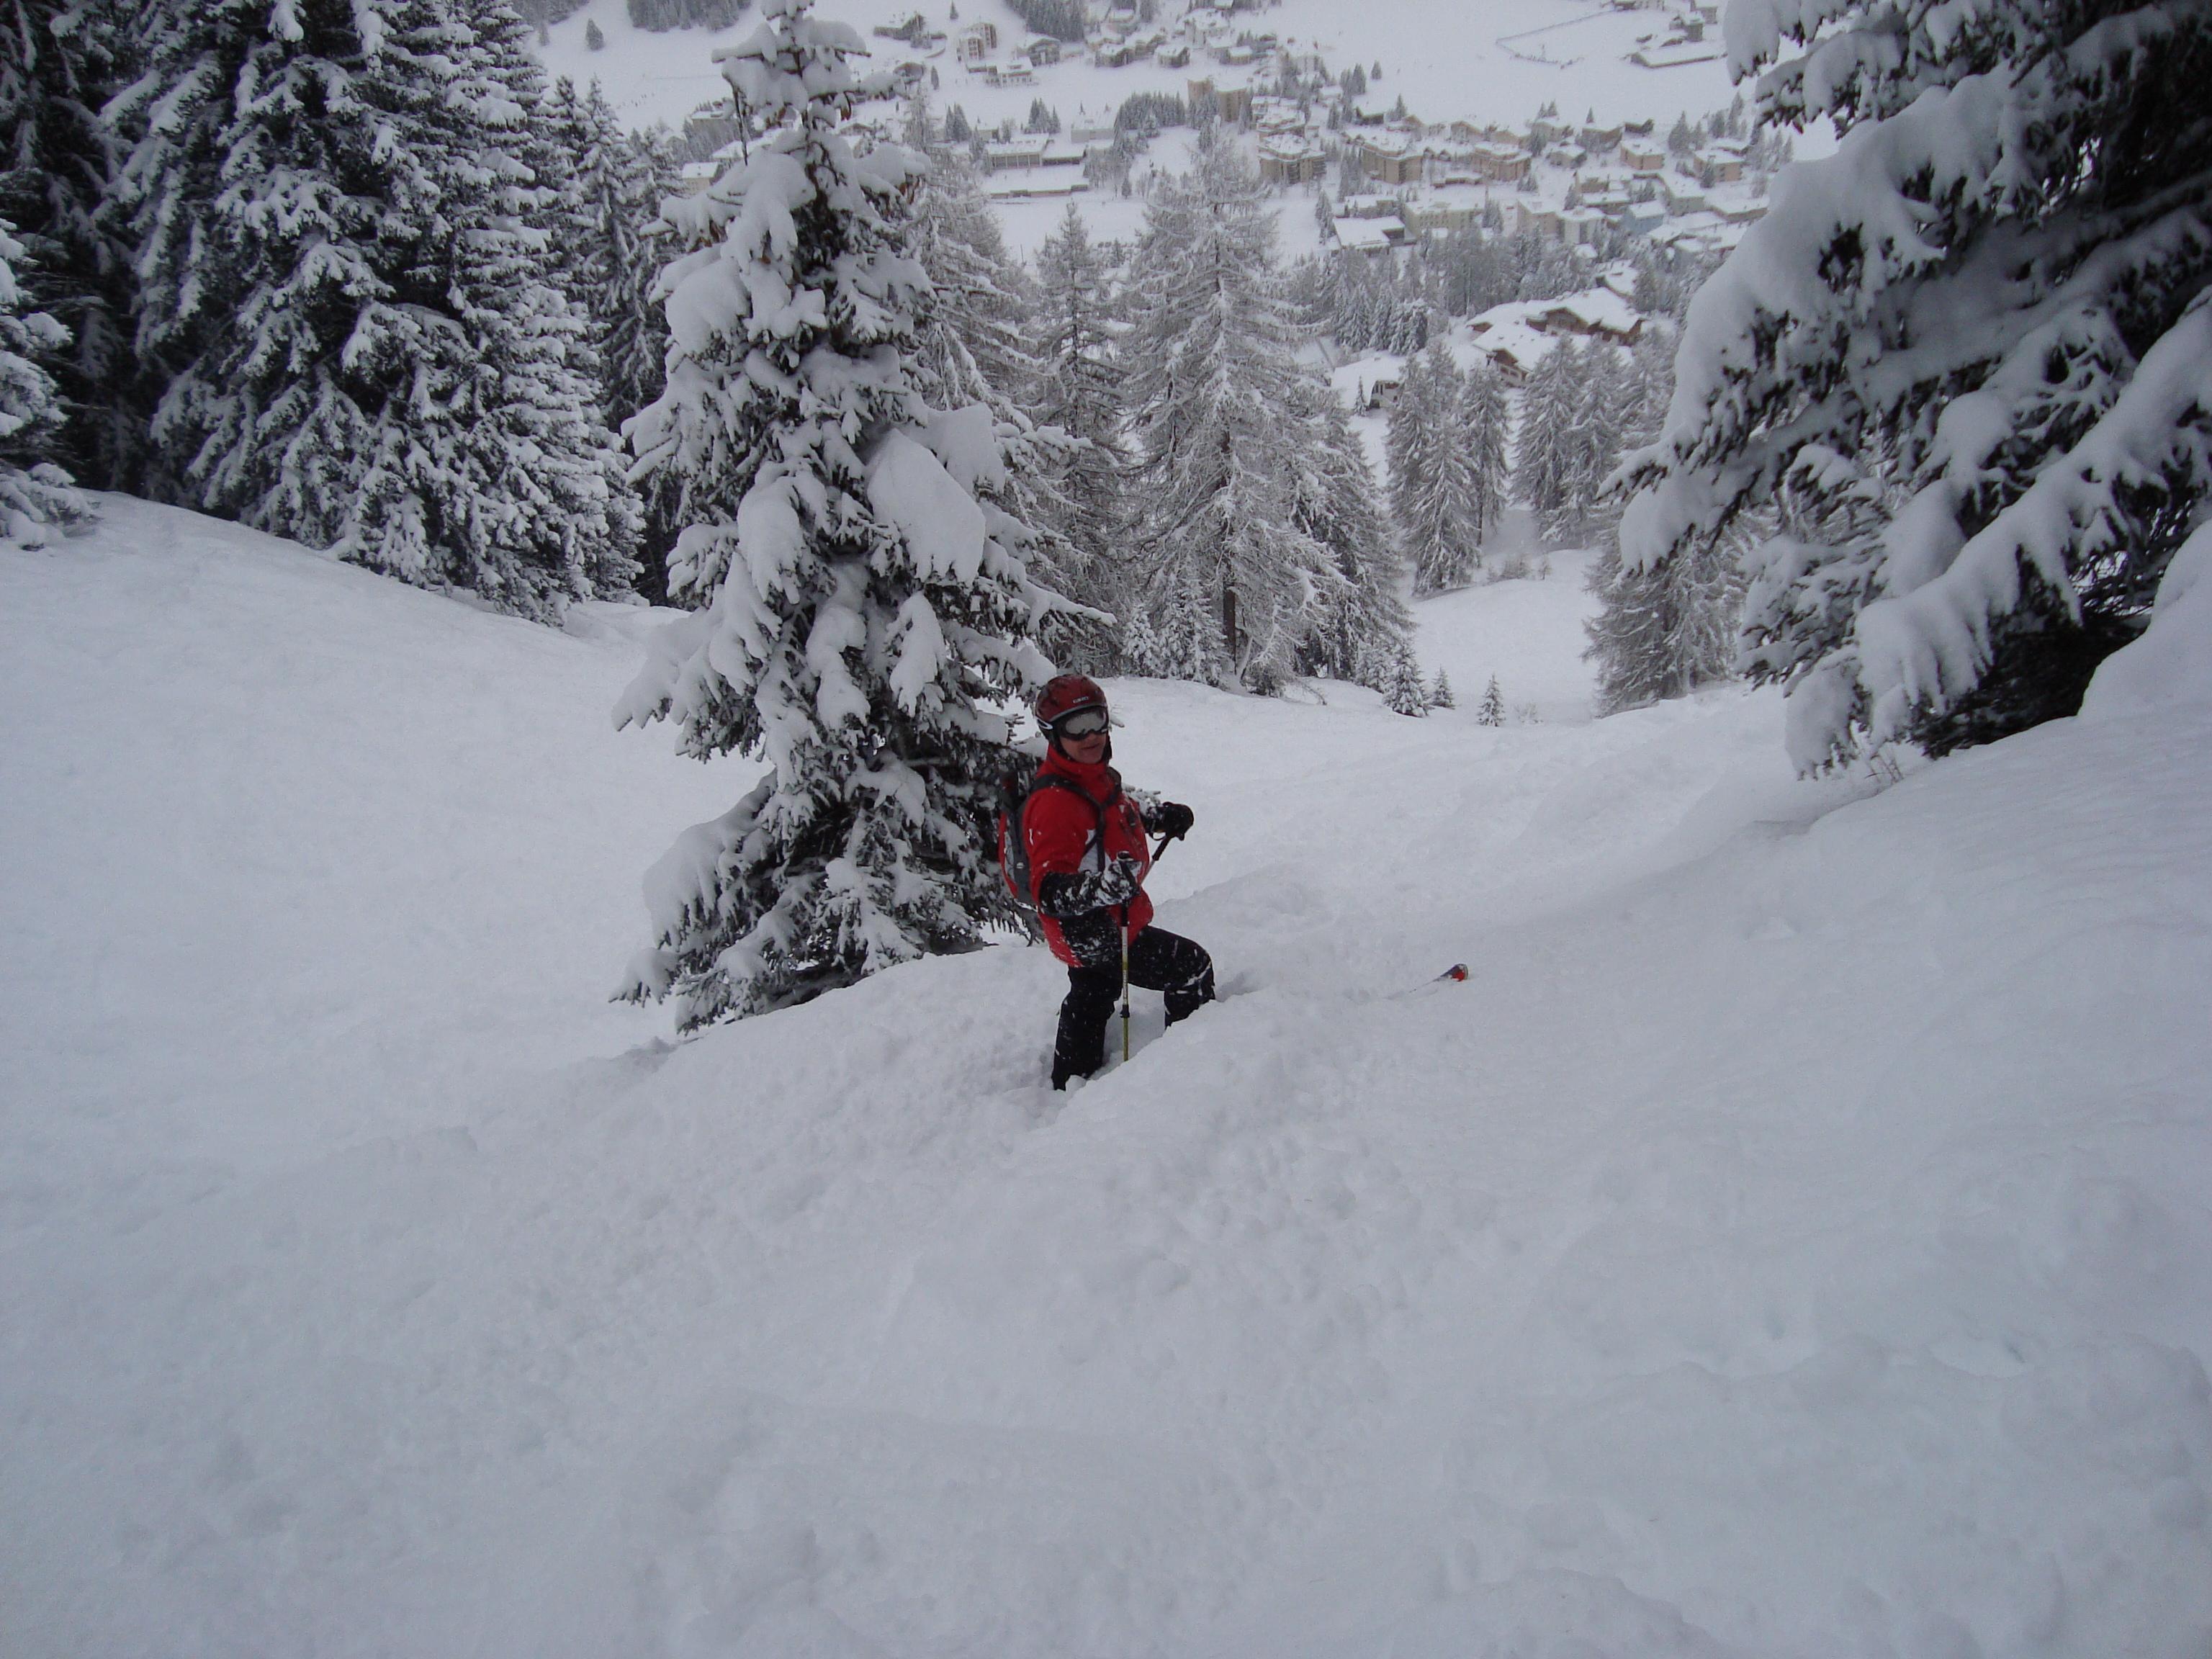 The snow on Parsenn just before Xmas, Davos